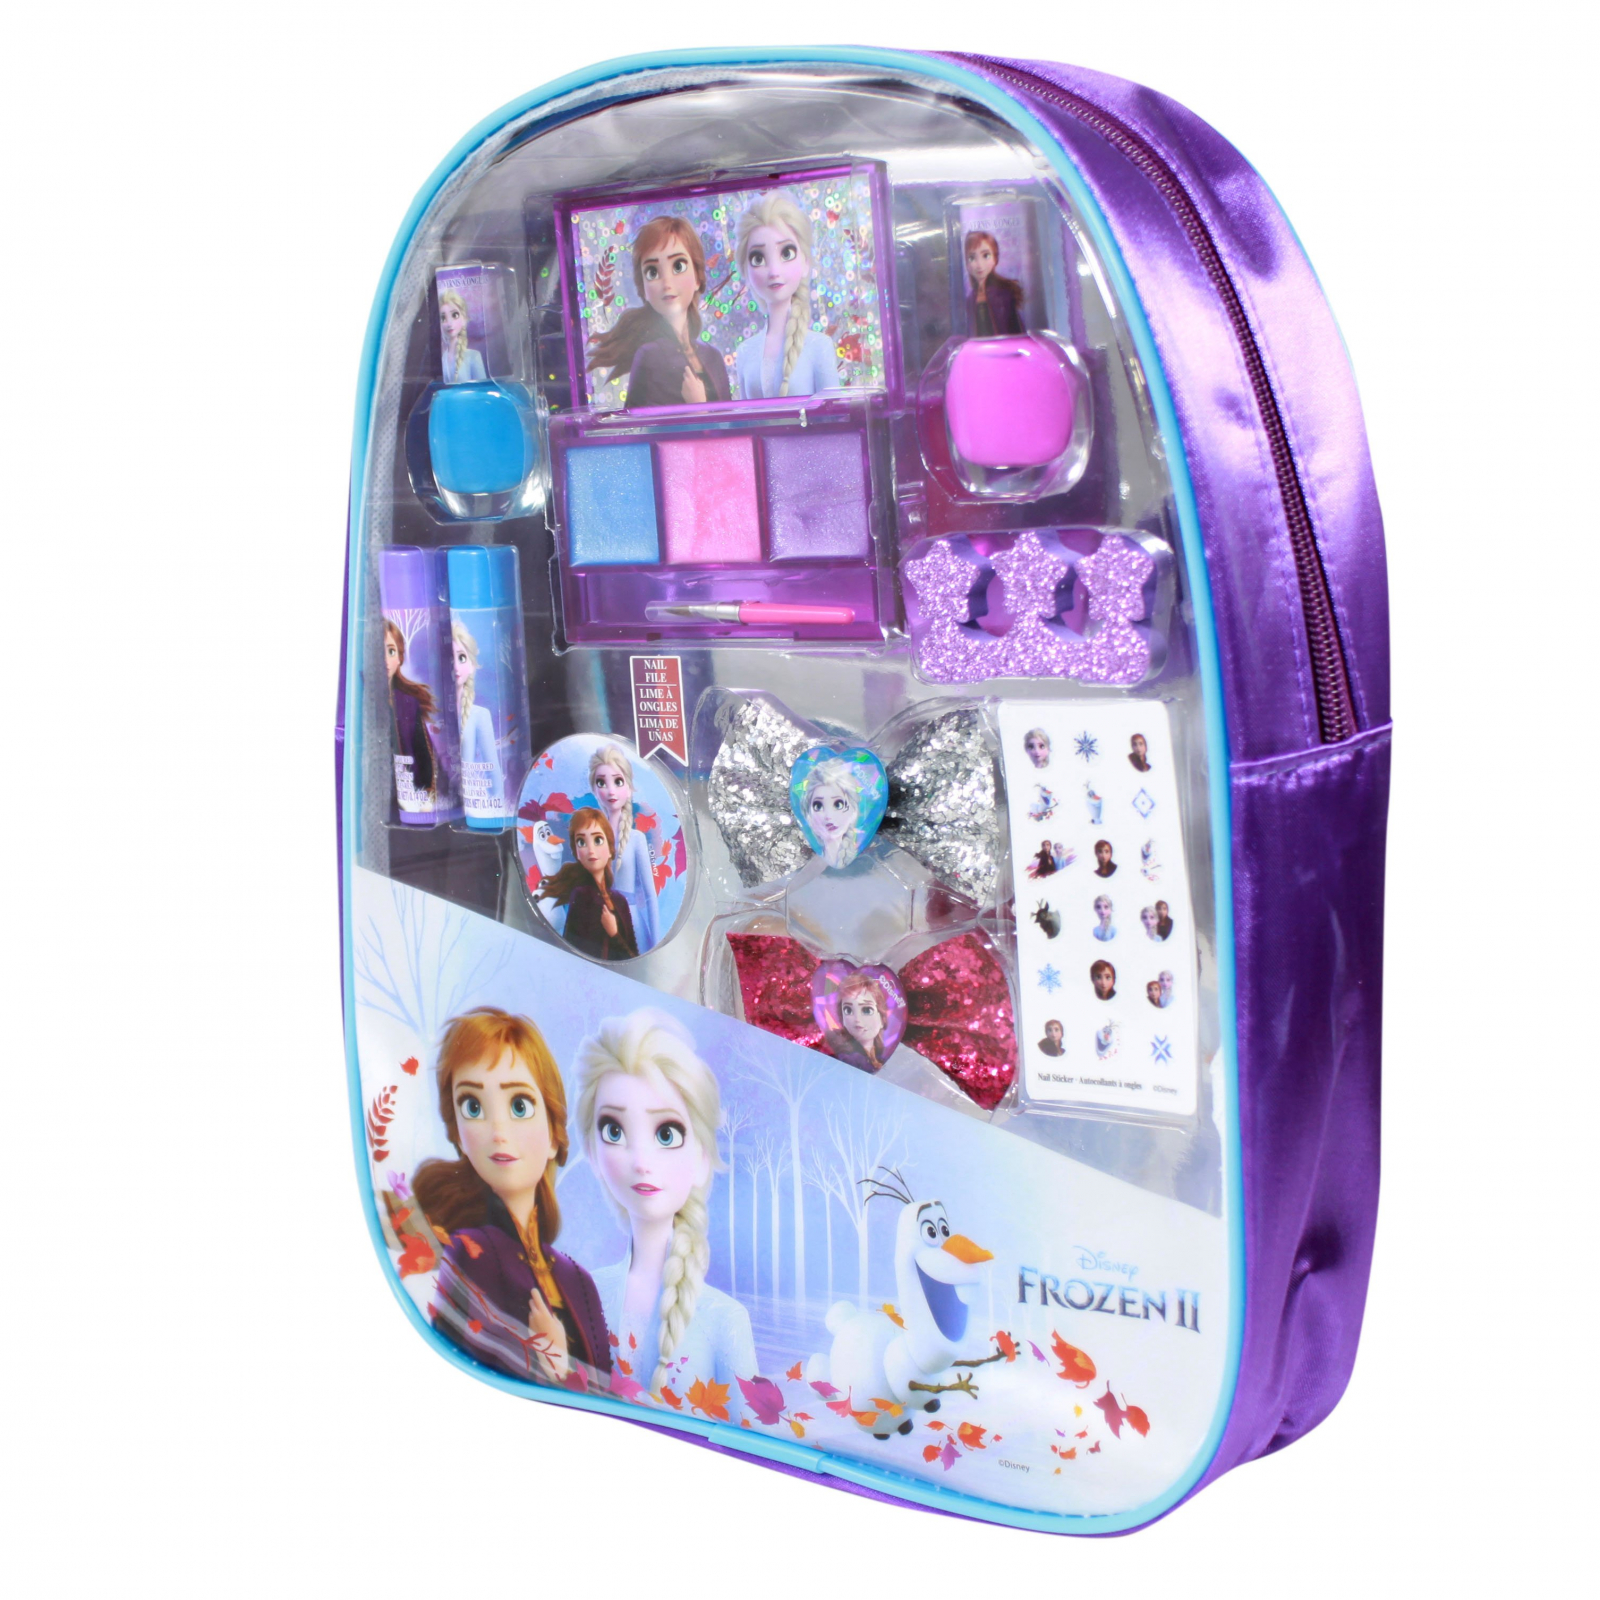 Disney Frozen 2 Girls PVC Backpack Cosmetics Gift Set 10pc